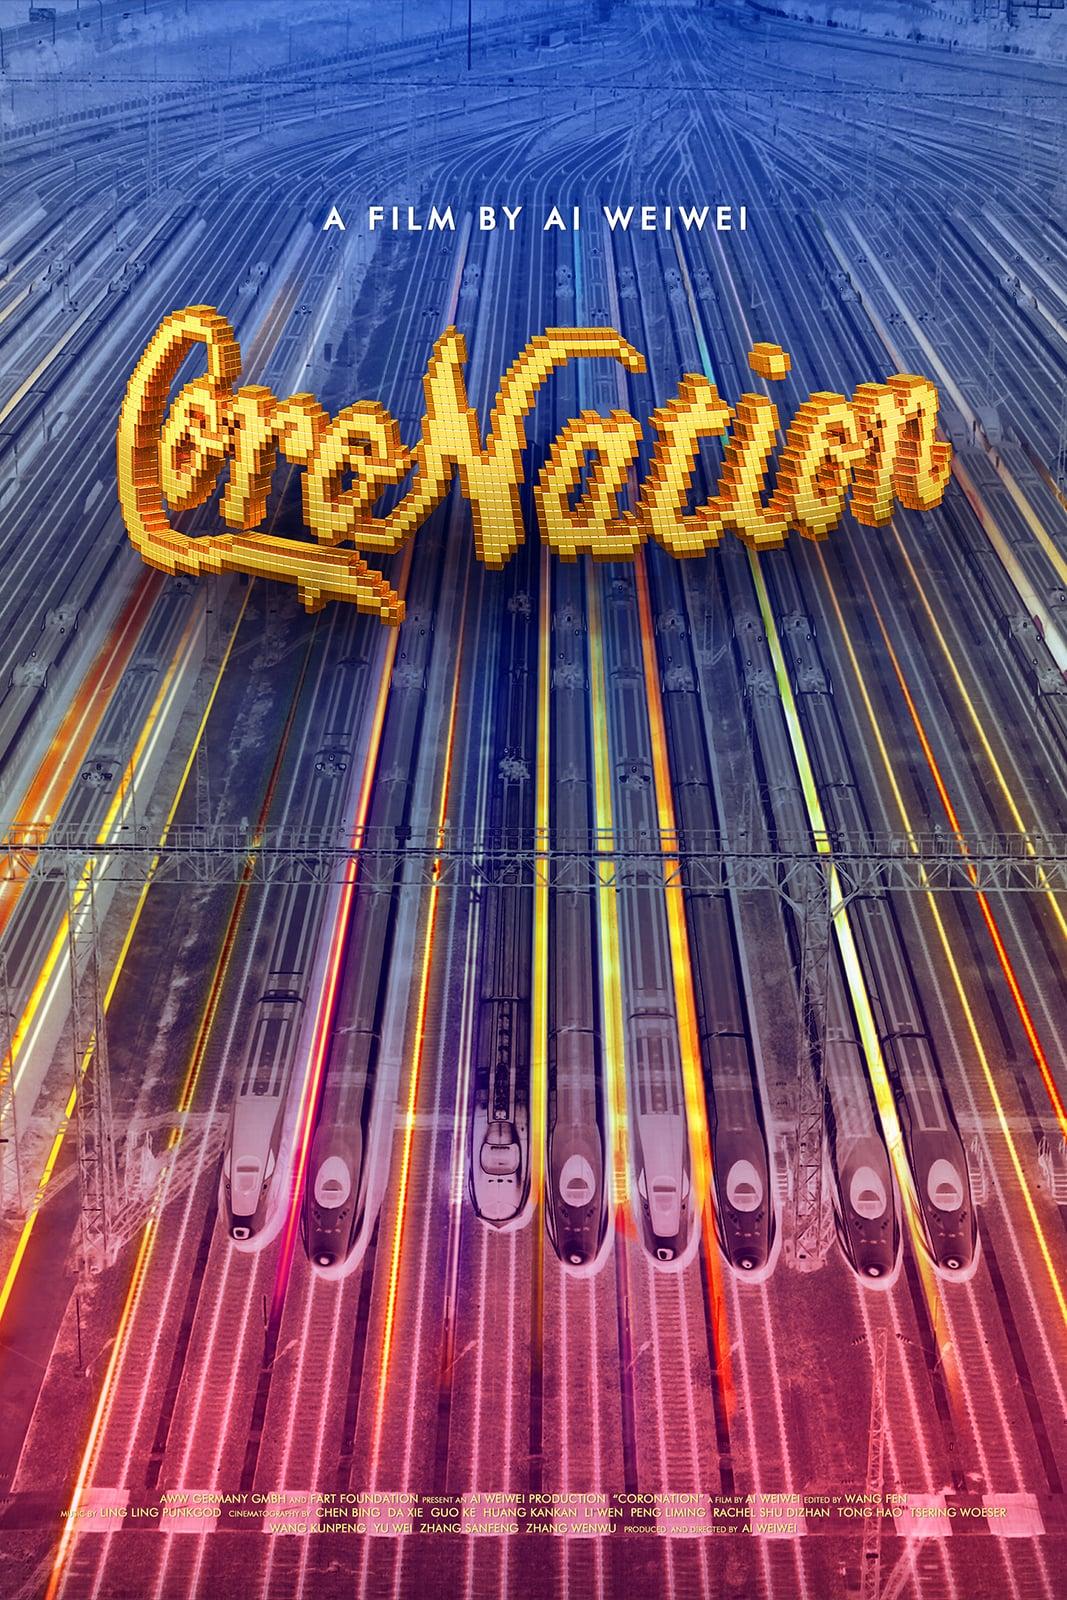 coronation-ai-weiwei-filme-critica-mostra-sp-poster